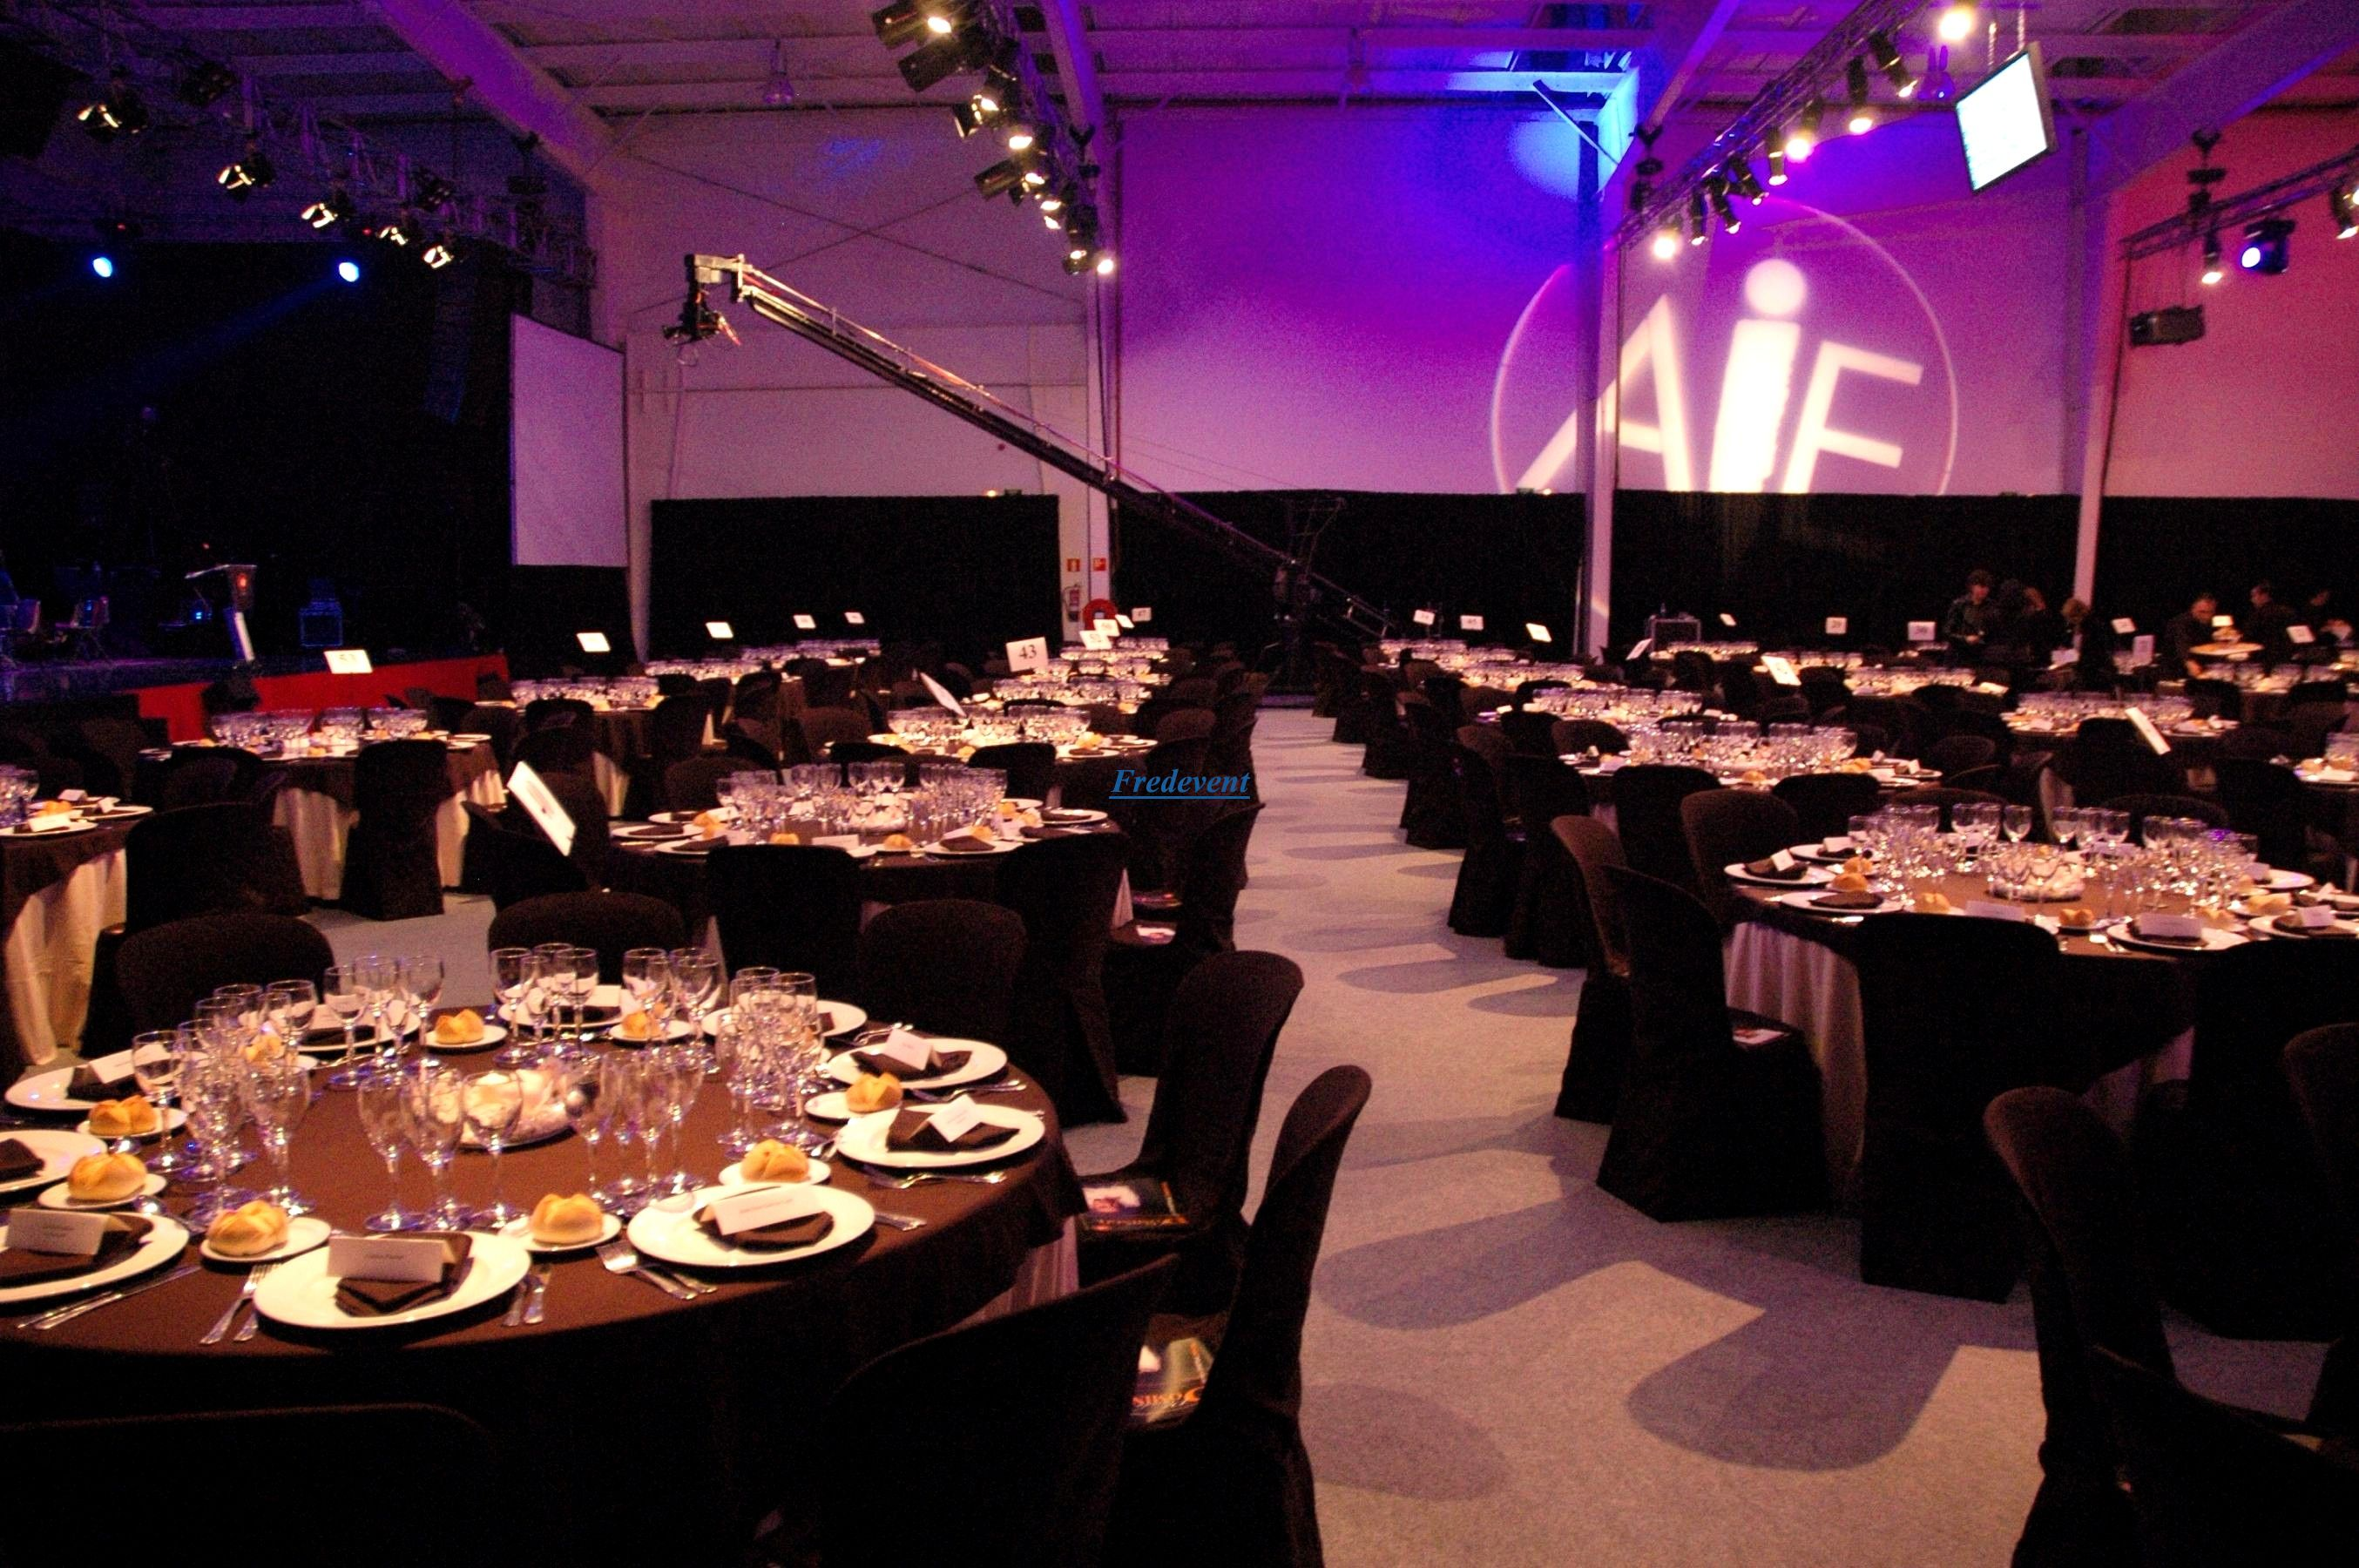 Empresas organizaci n de eventos organizacion eventos for Cenas para invitados